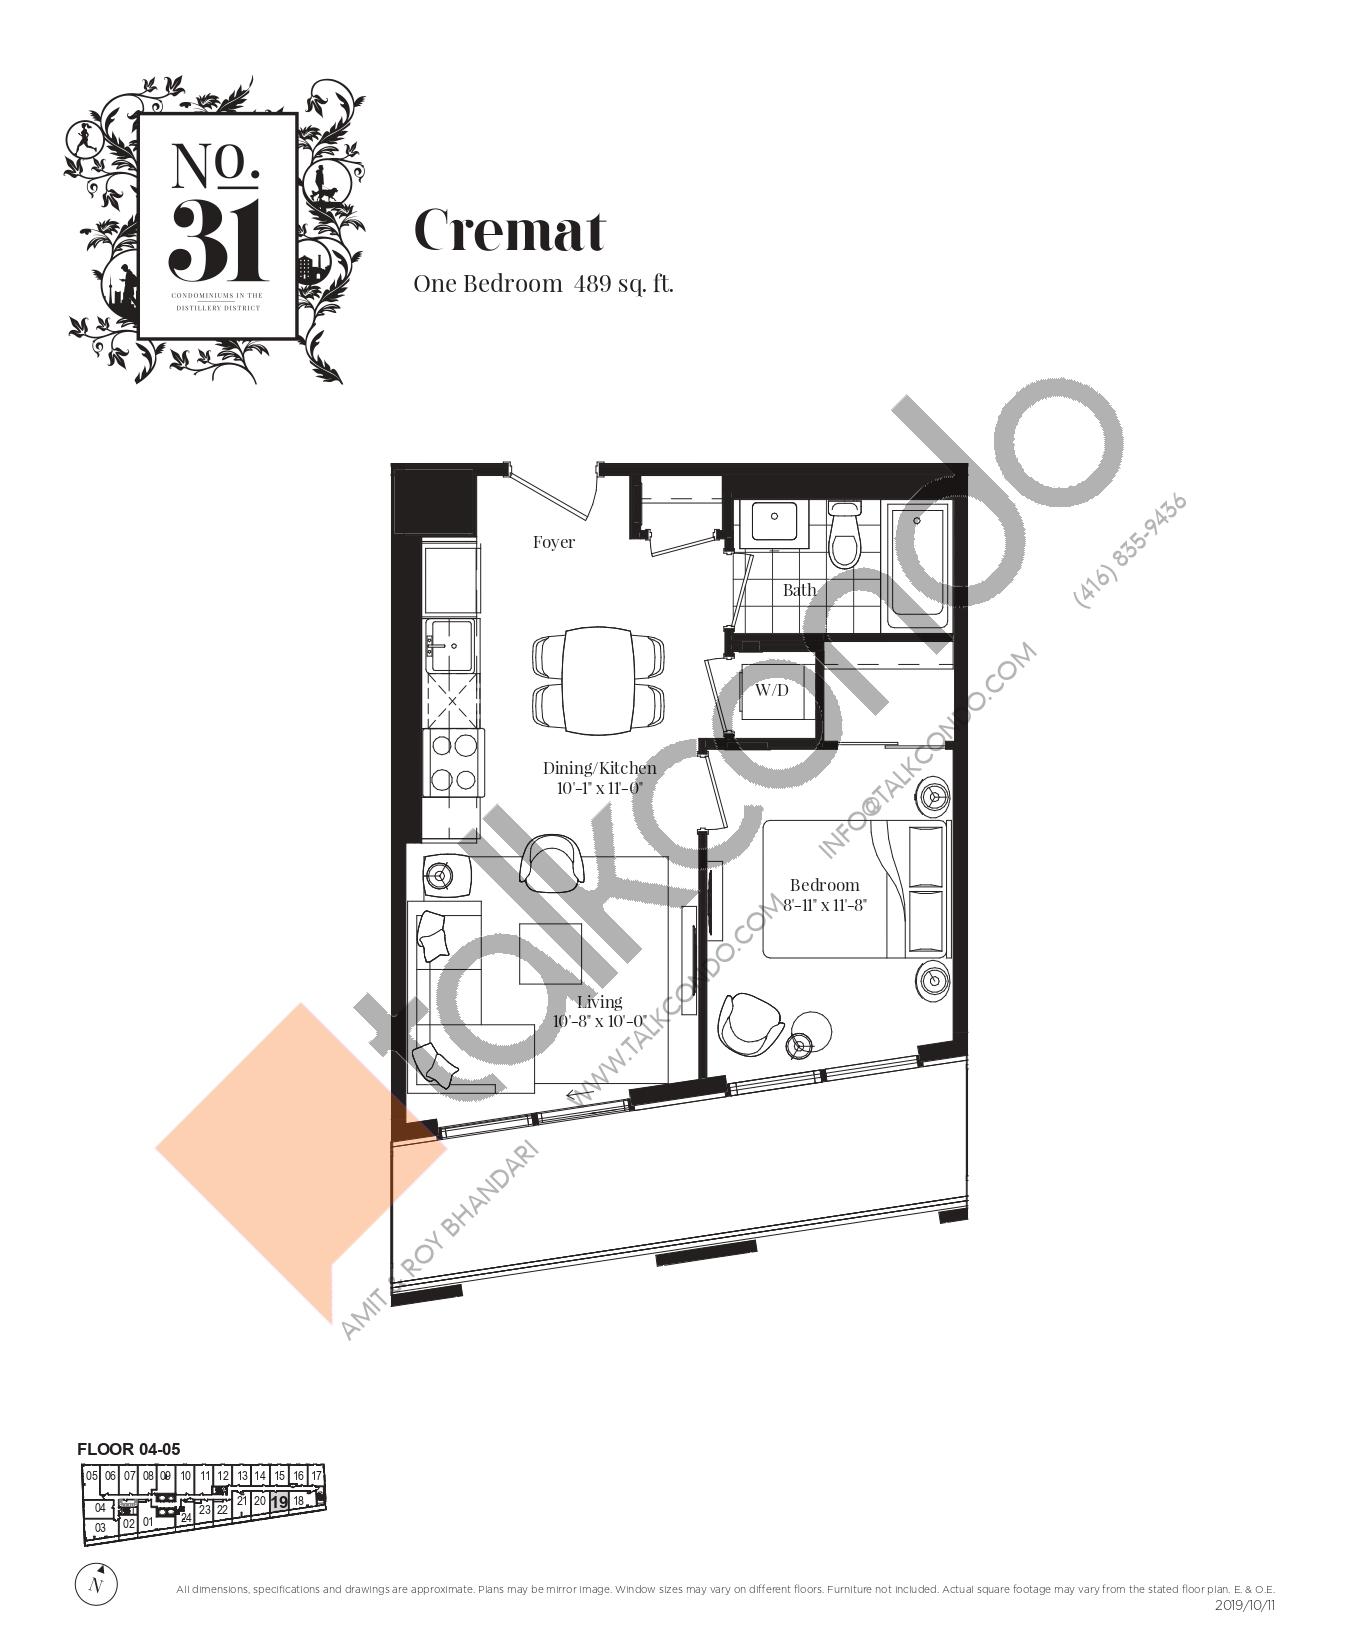 Cremat Floor Plan at No. 31 Condos - 489 sq.ft